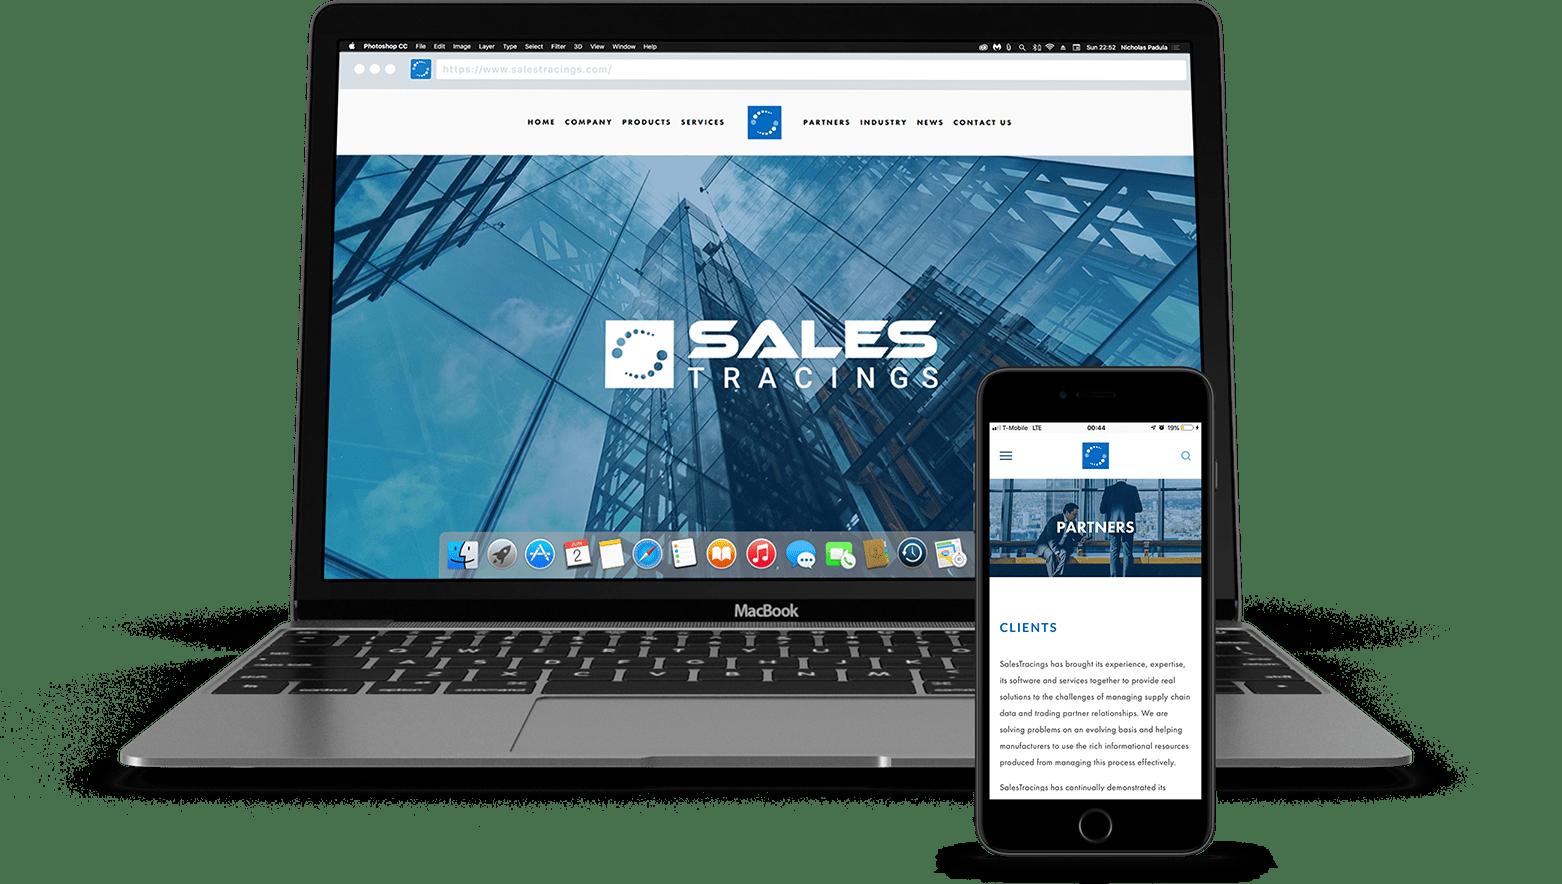 salestracings-min.png